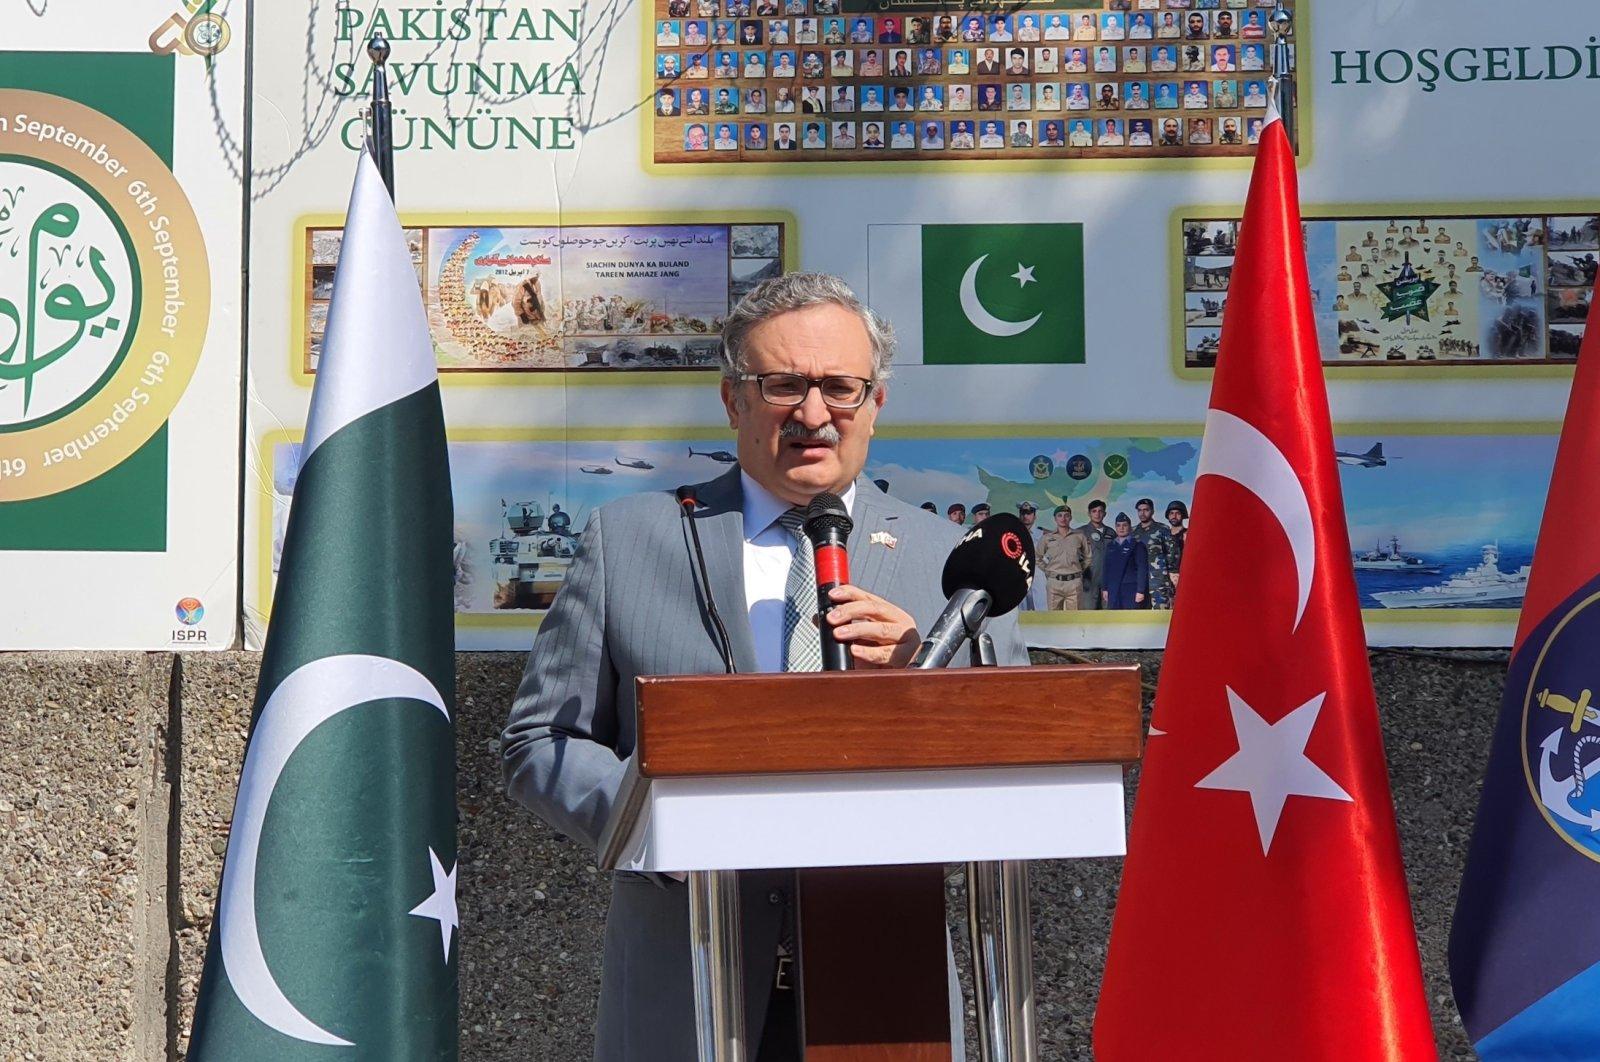 Pakistan's Ambassador Muhammed Syrus Sajjad Qazi speaks at the commemoration ceremony in Ankara, Turkey, Sept. 6, 2021. (AA Photo)